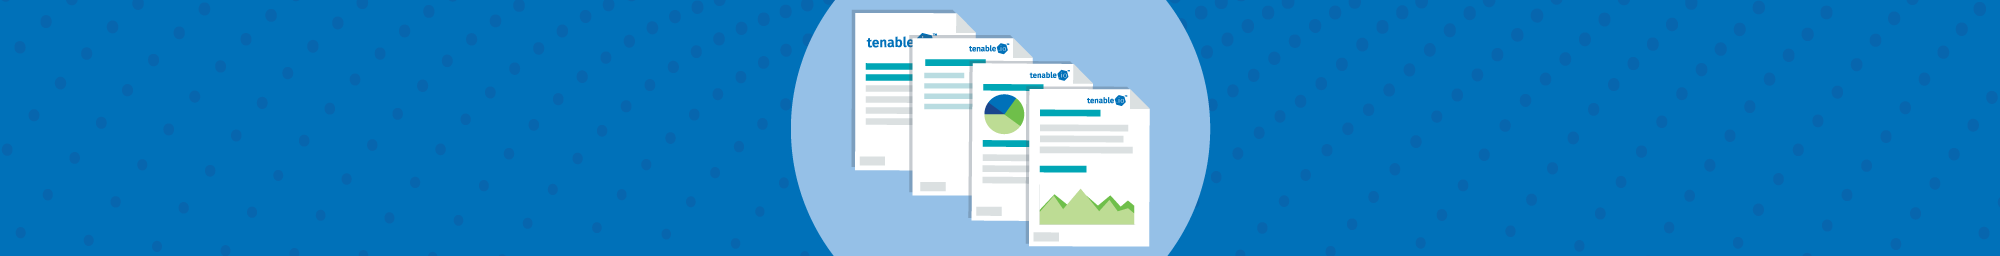 Tenable Blog